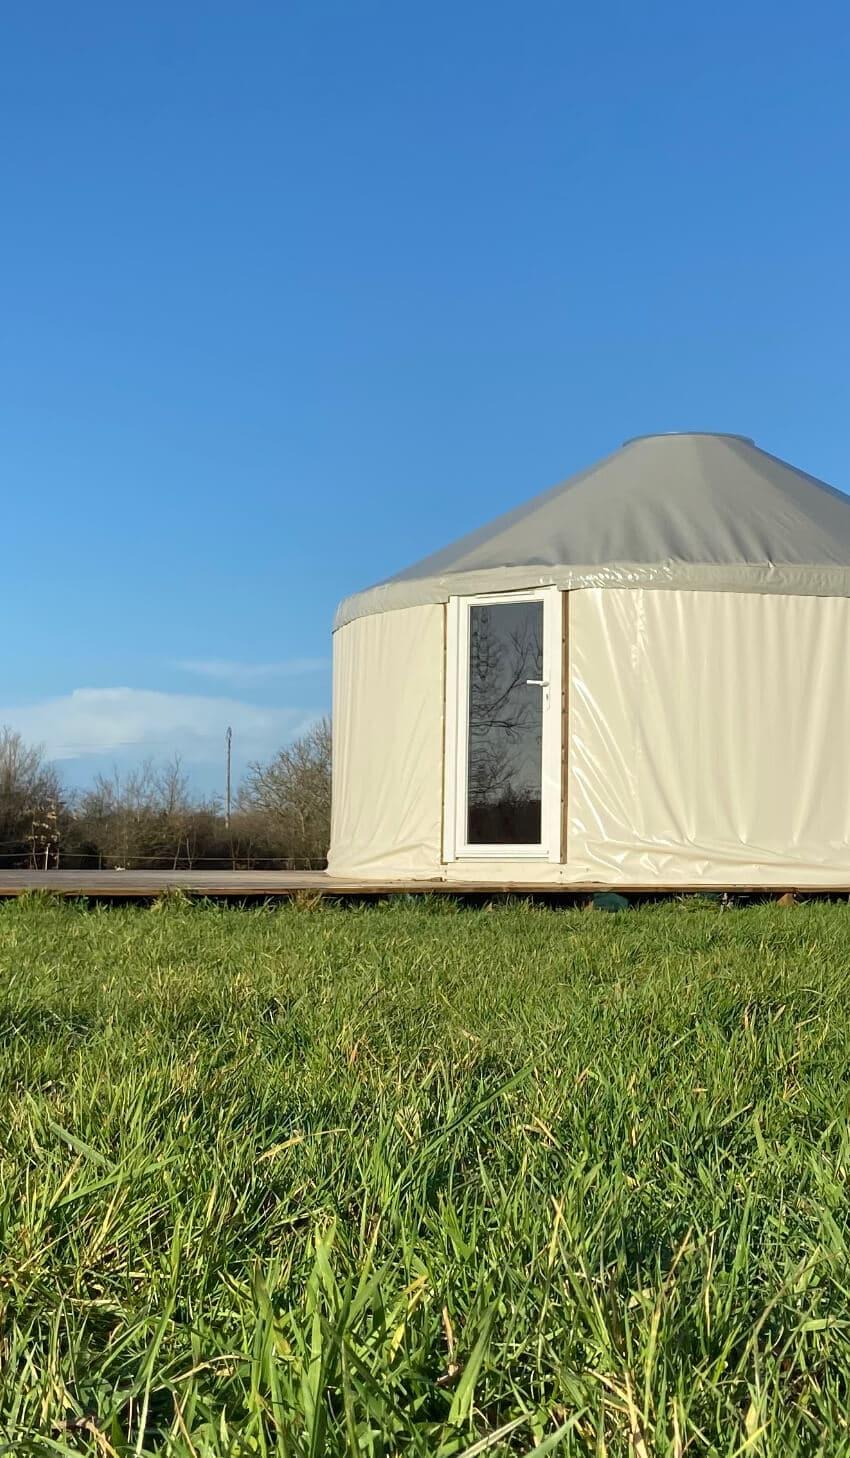 Location de grnade yourte aménagée en camping